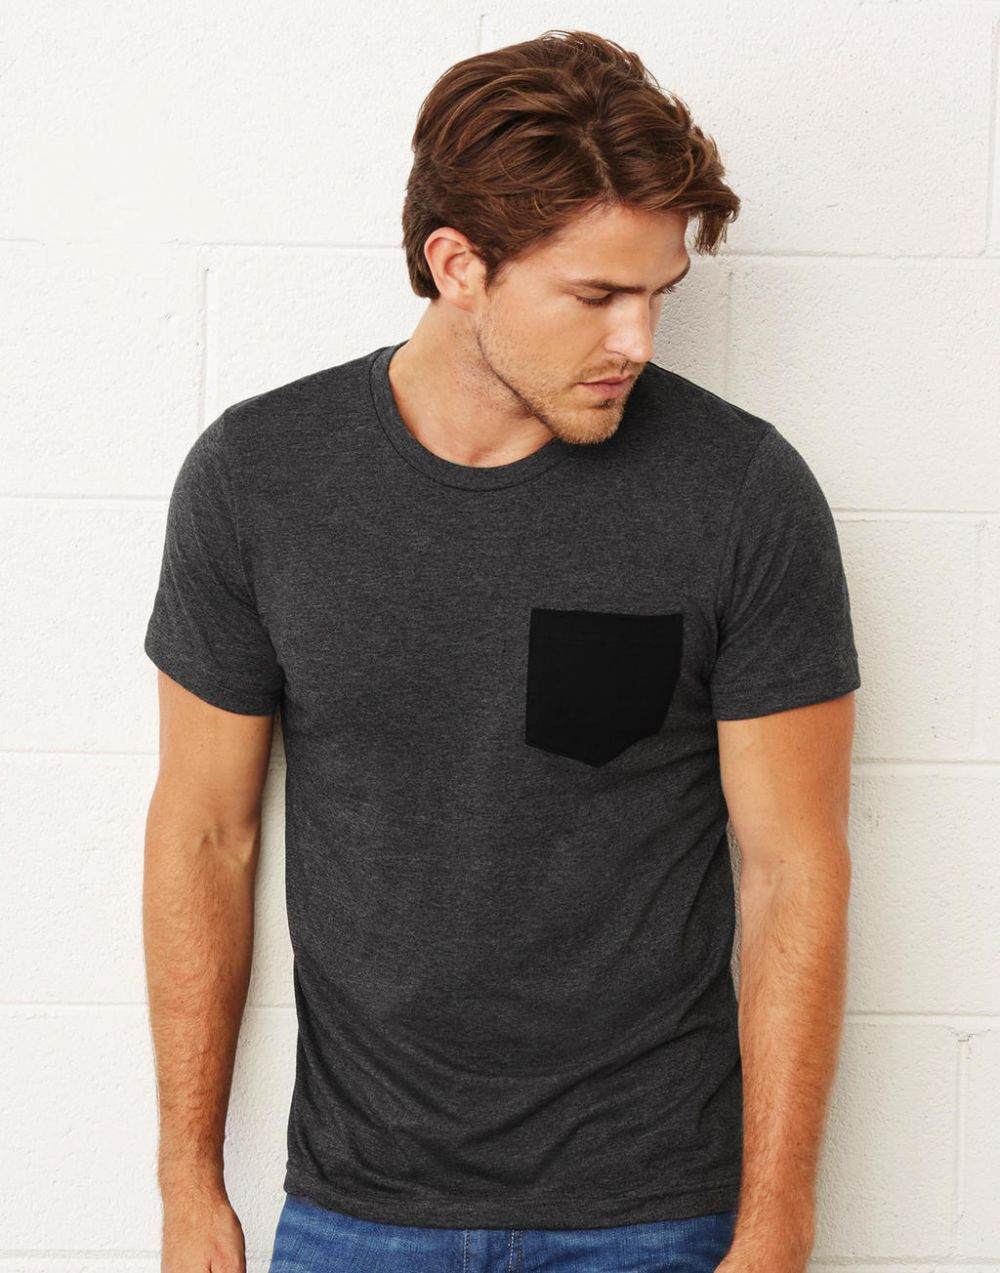 Camisetas manga corta bella con bolsillo hombre imagen 2